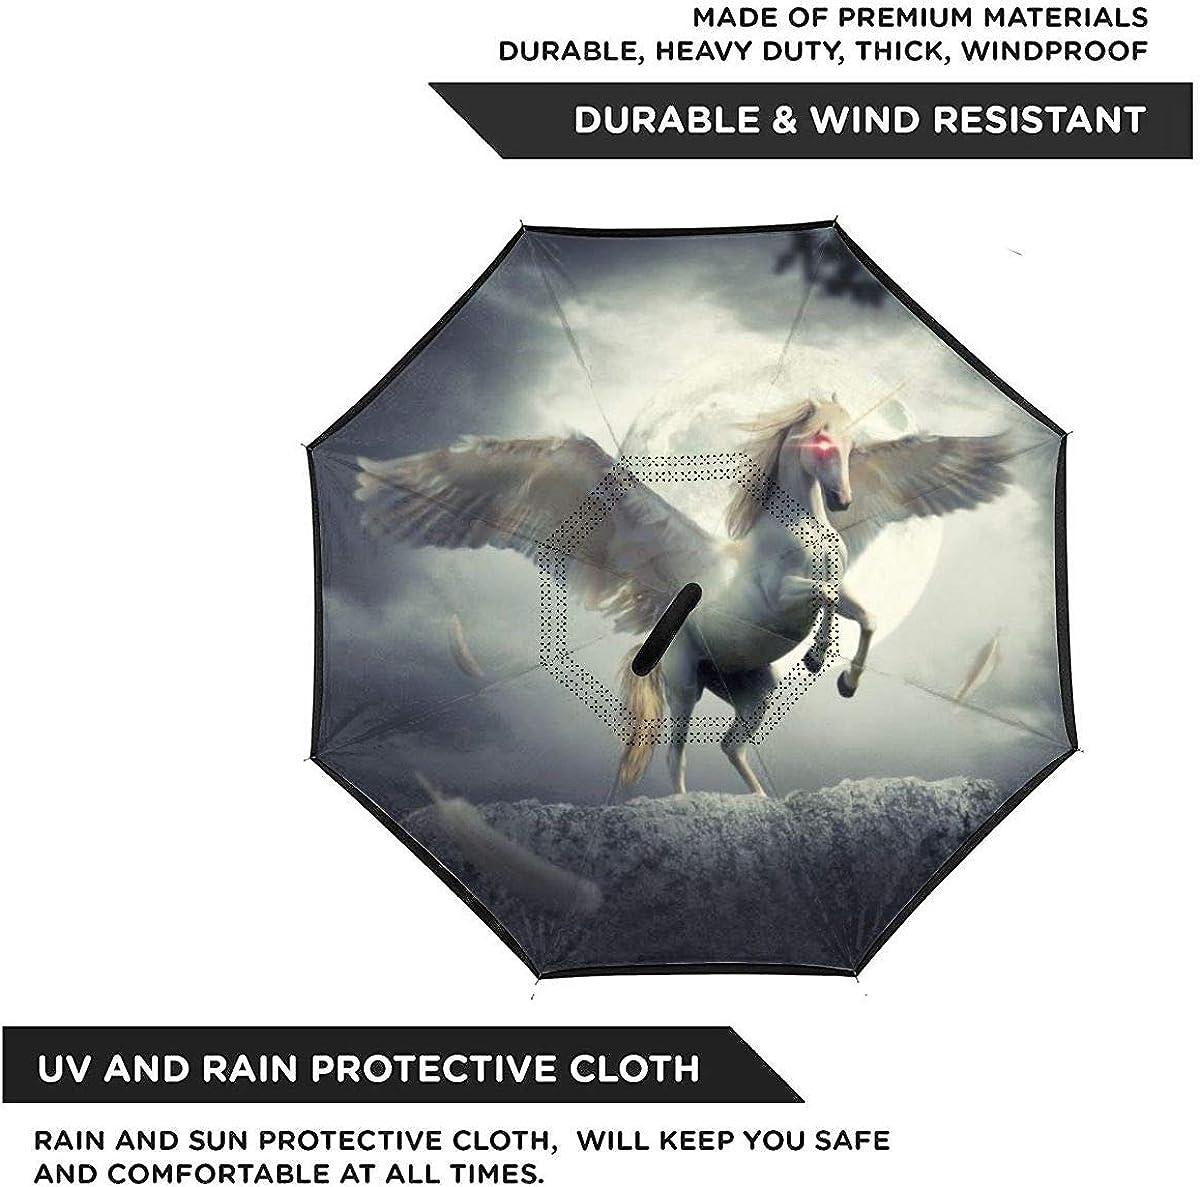 Reverse Umbrella Double Layer Inverted Umbrellas For Car Rain Outdoor With C-Shaped Handle Fantasy Unicorn Fairy Tale Night Moon Tree Horse Customized